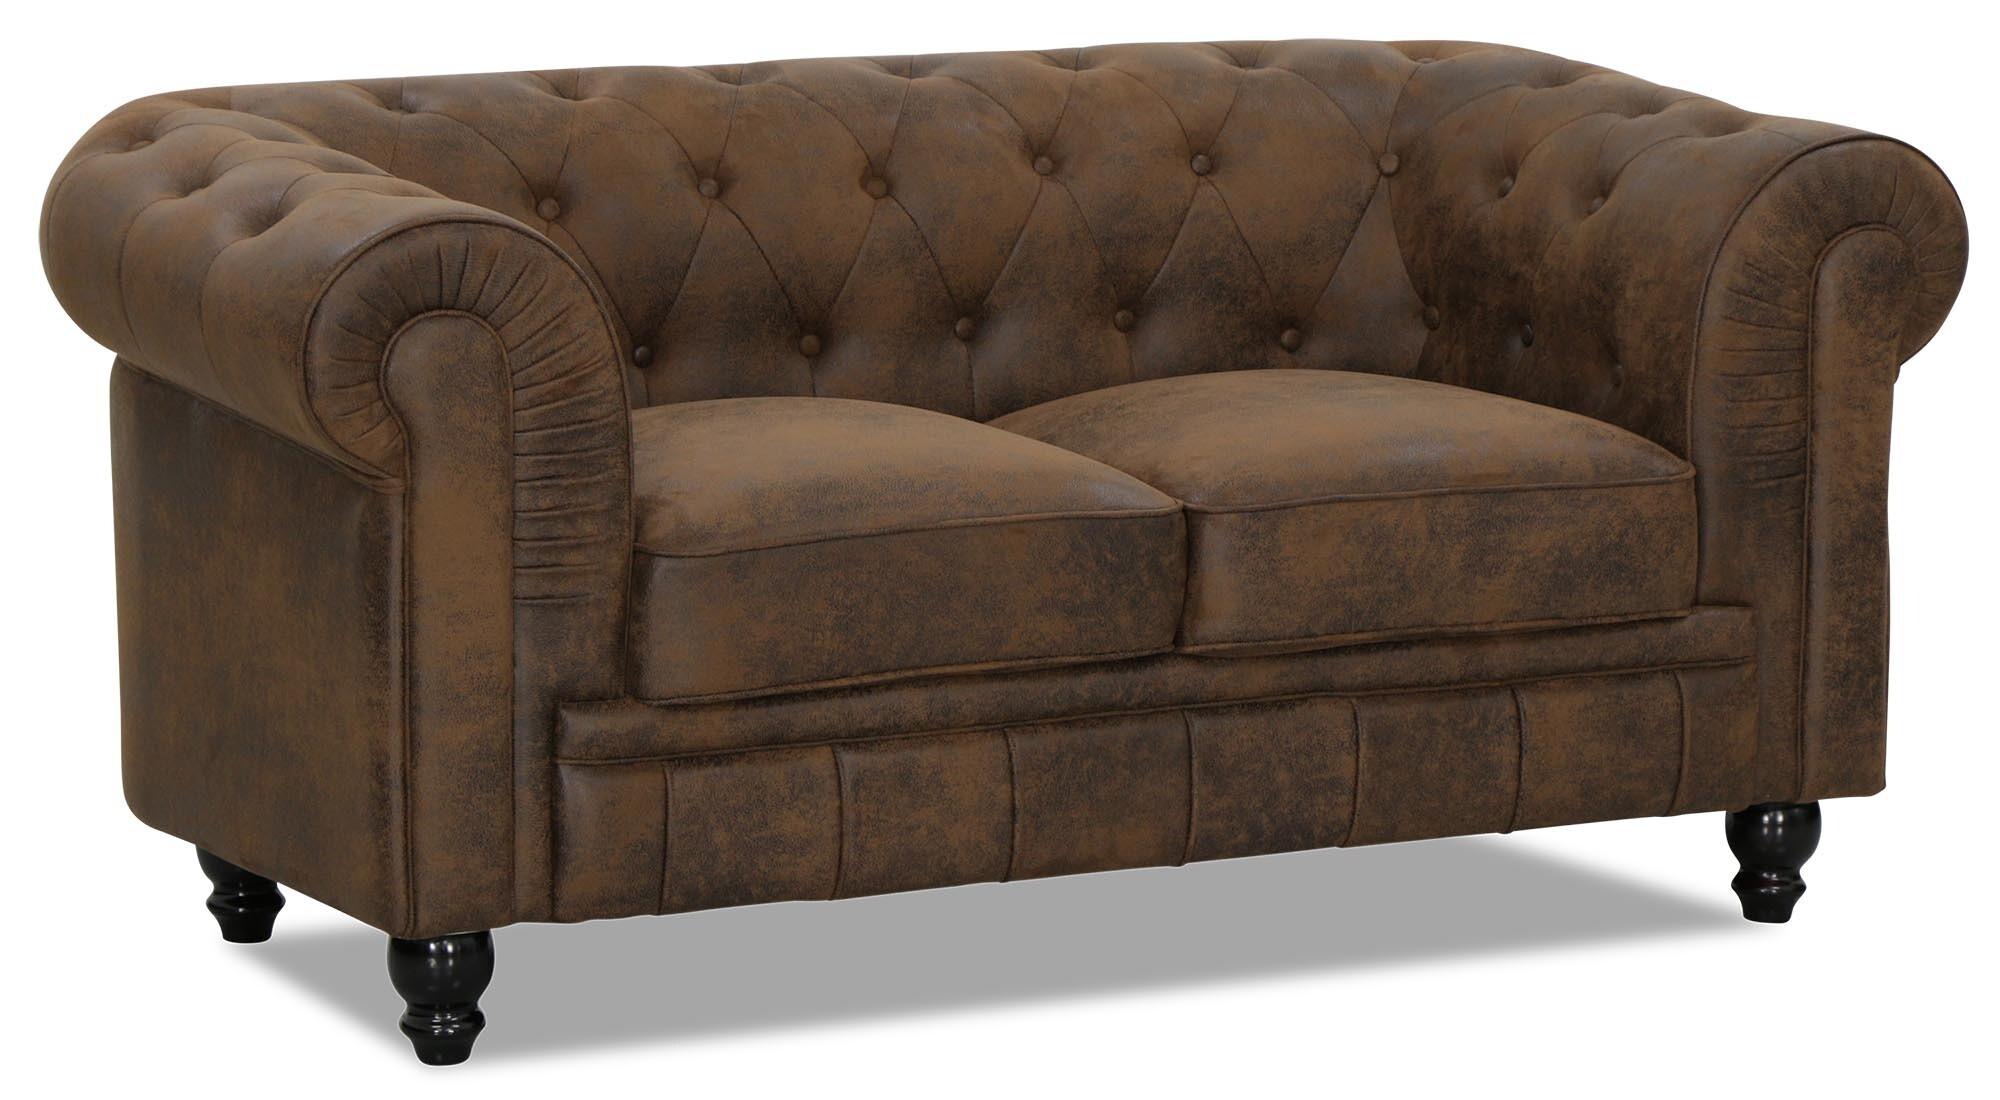 Benjamin Clical 2 Seater Vintage Pu Leather Sofa